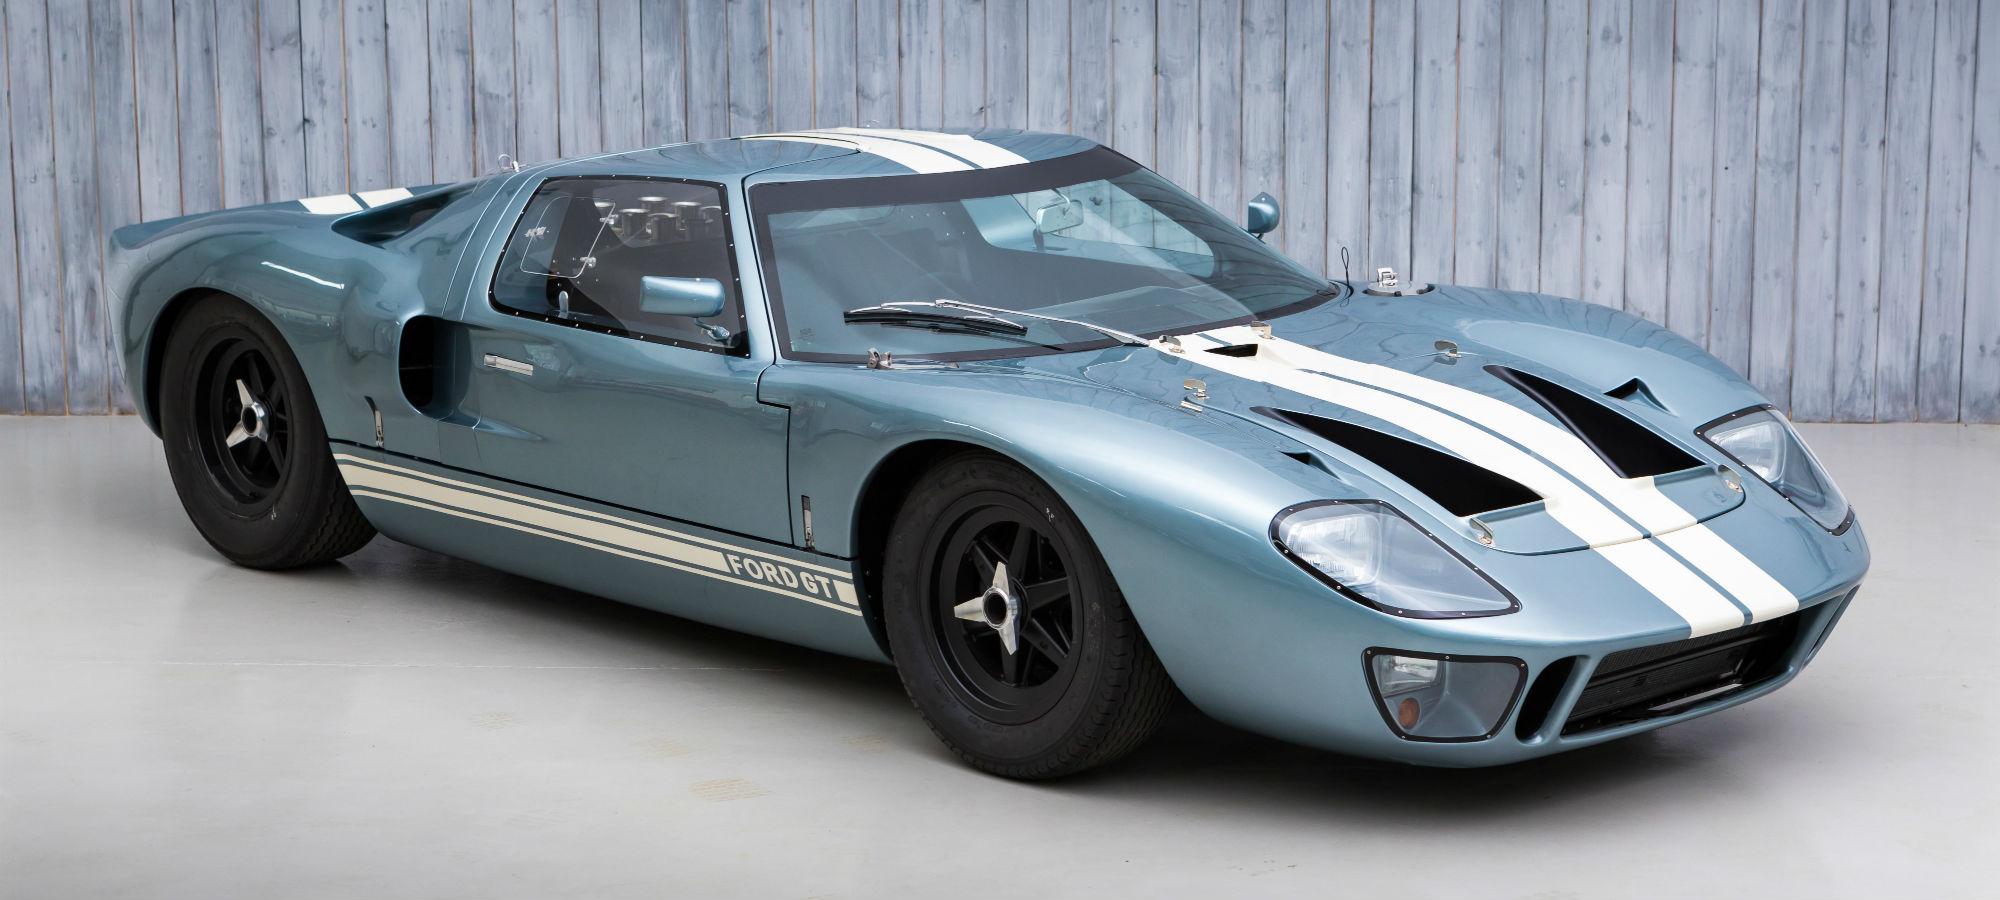 Gelscoe GT40